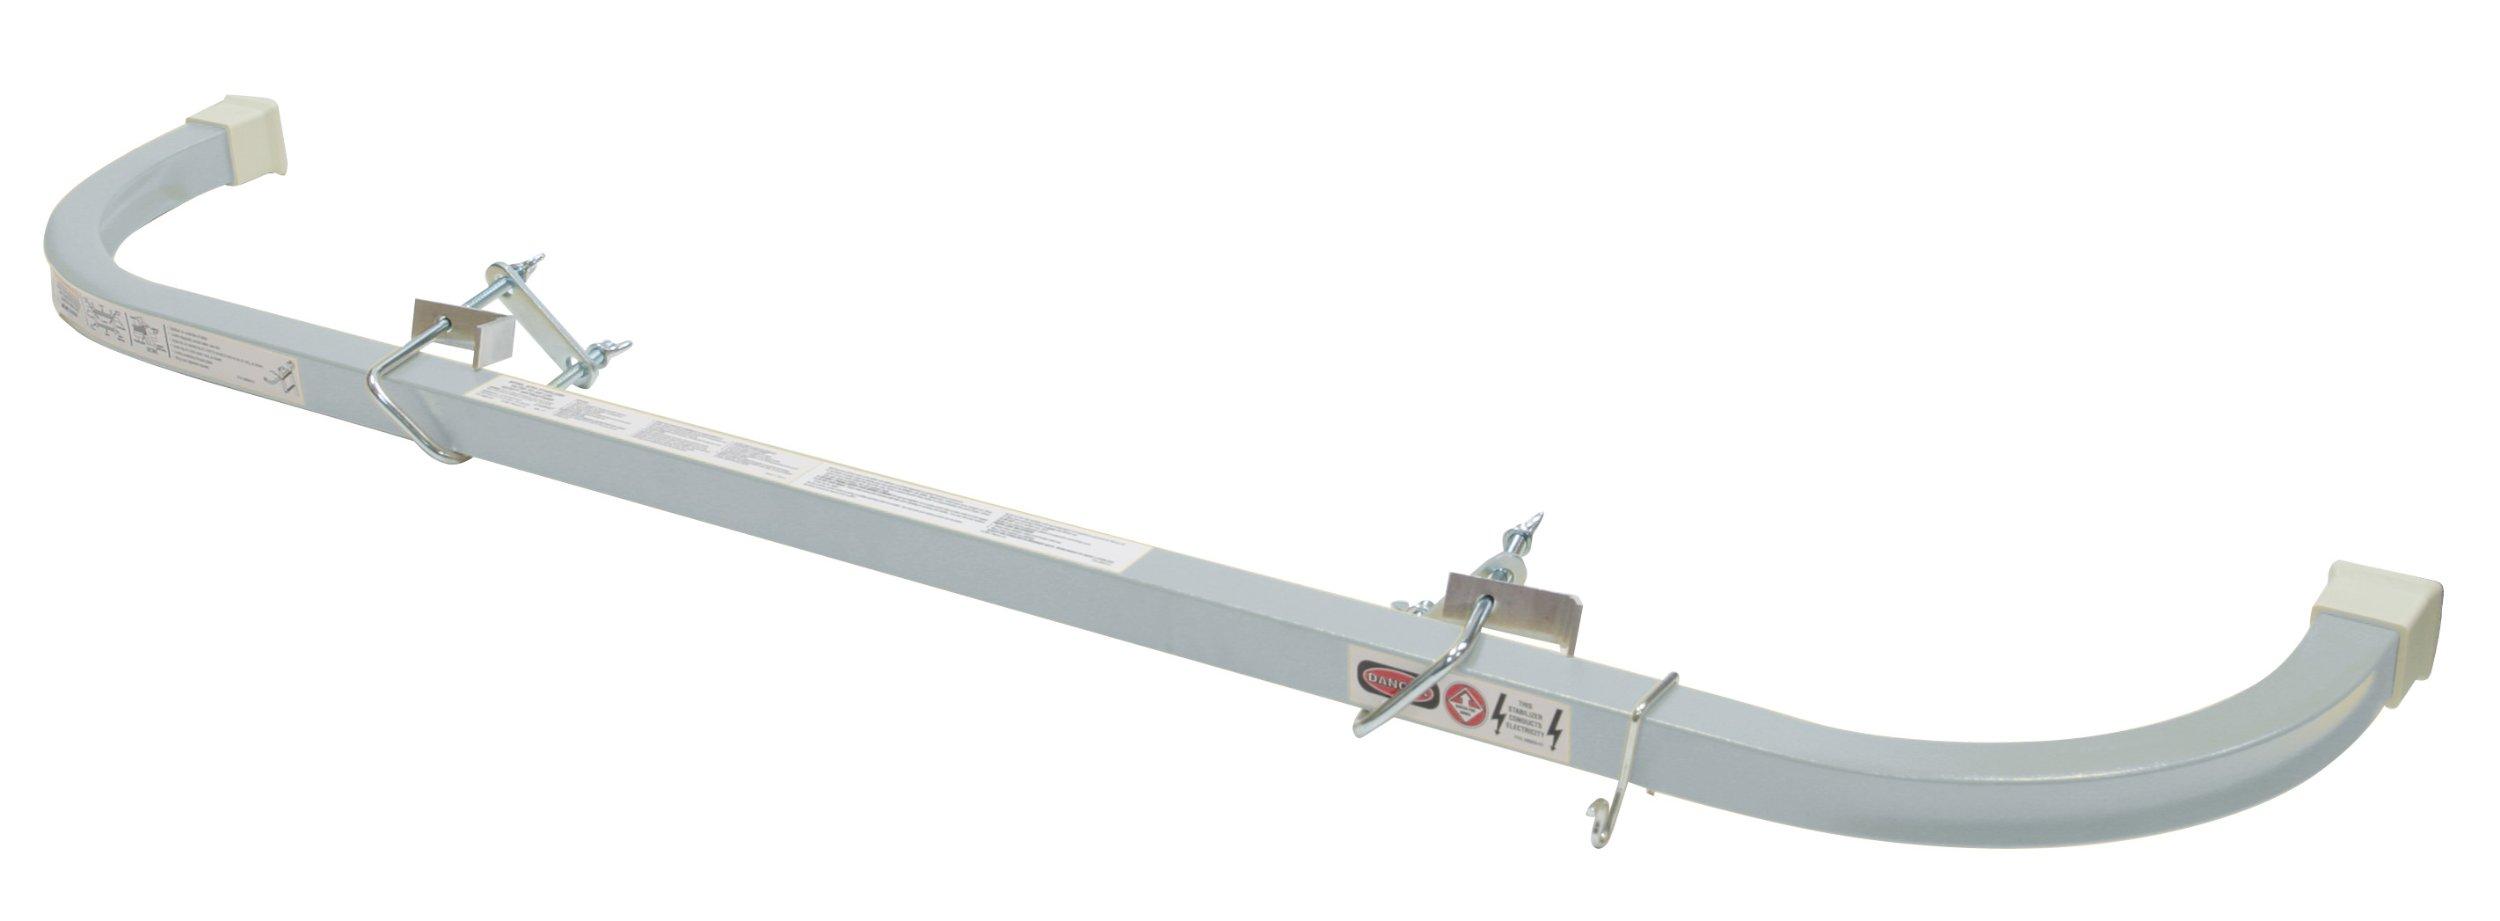 Werner AC96 Aluminum Standoff Stabilizer